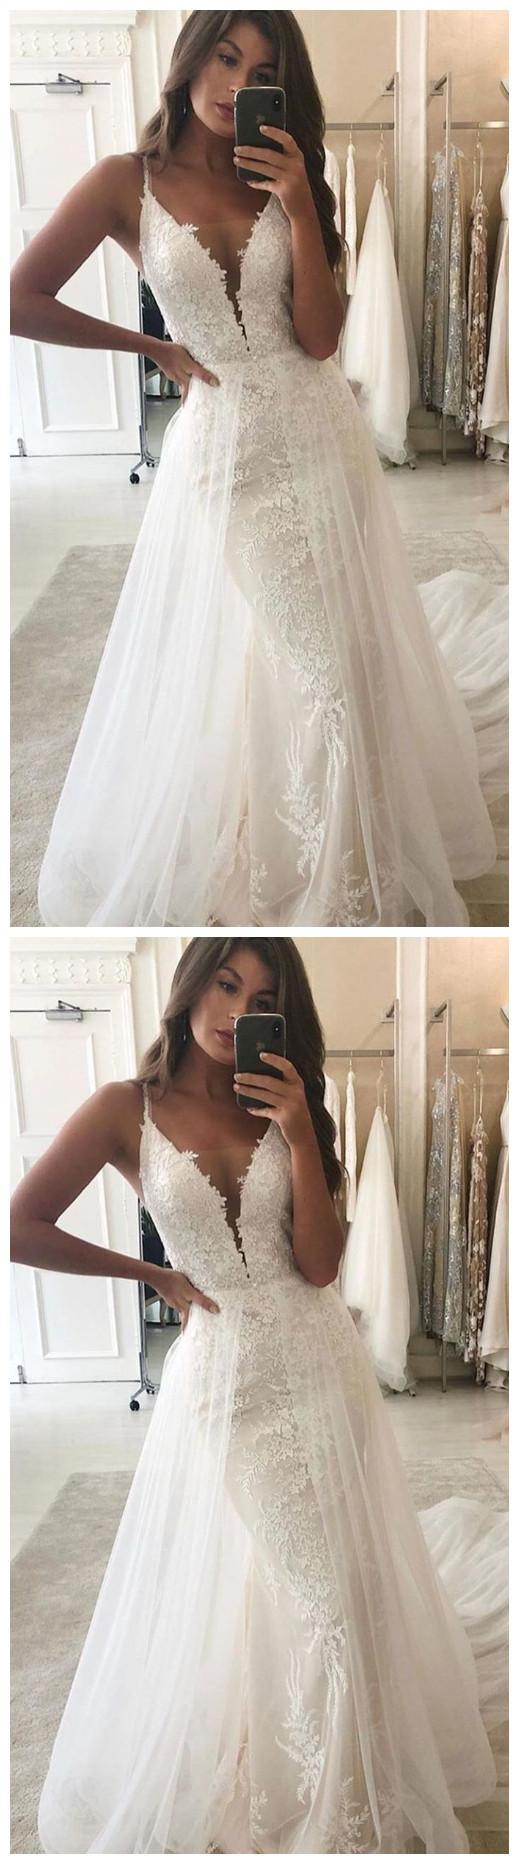 length women dresses v-neck tulle floor length party dress applique lace special